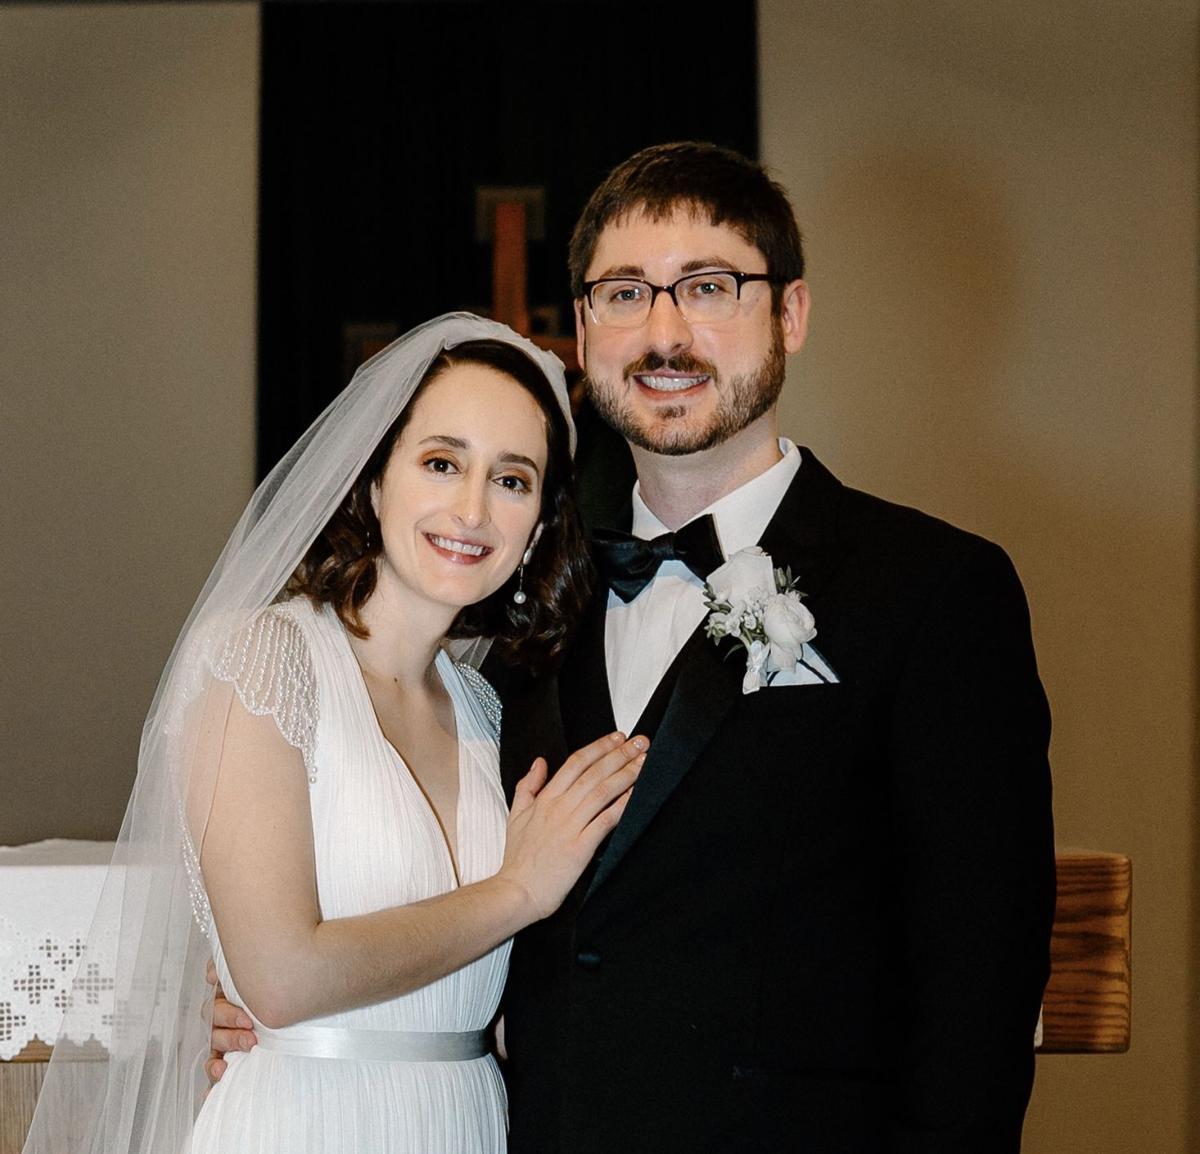 Vecchiato-Pellatt Wedding Photo.jpeg